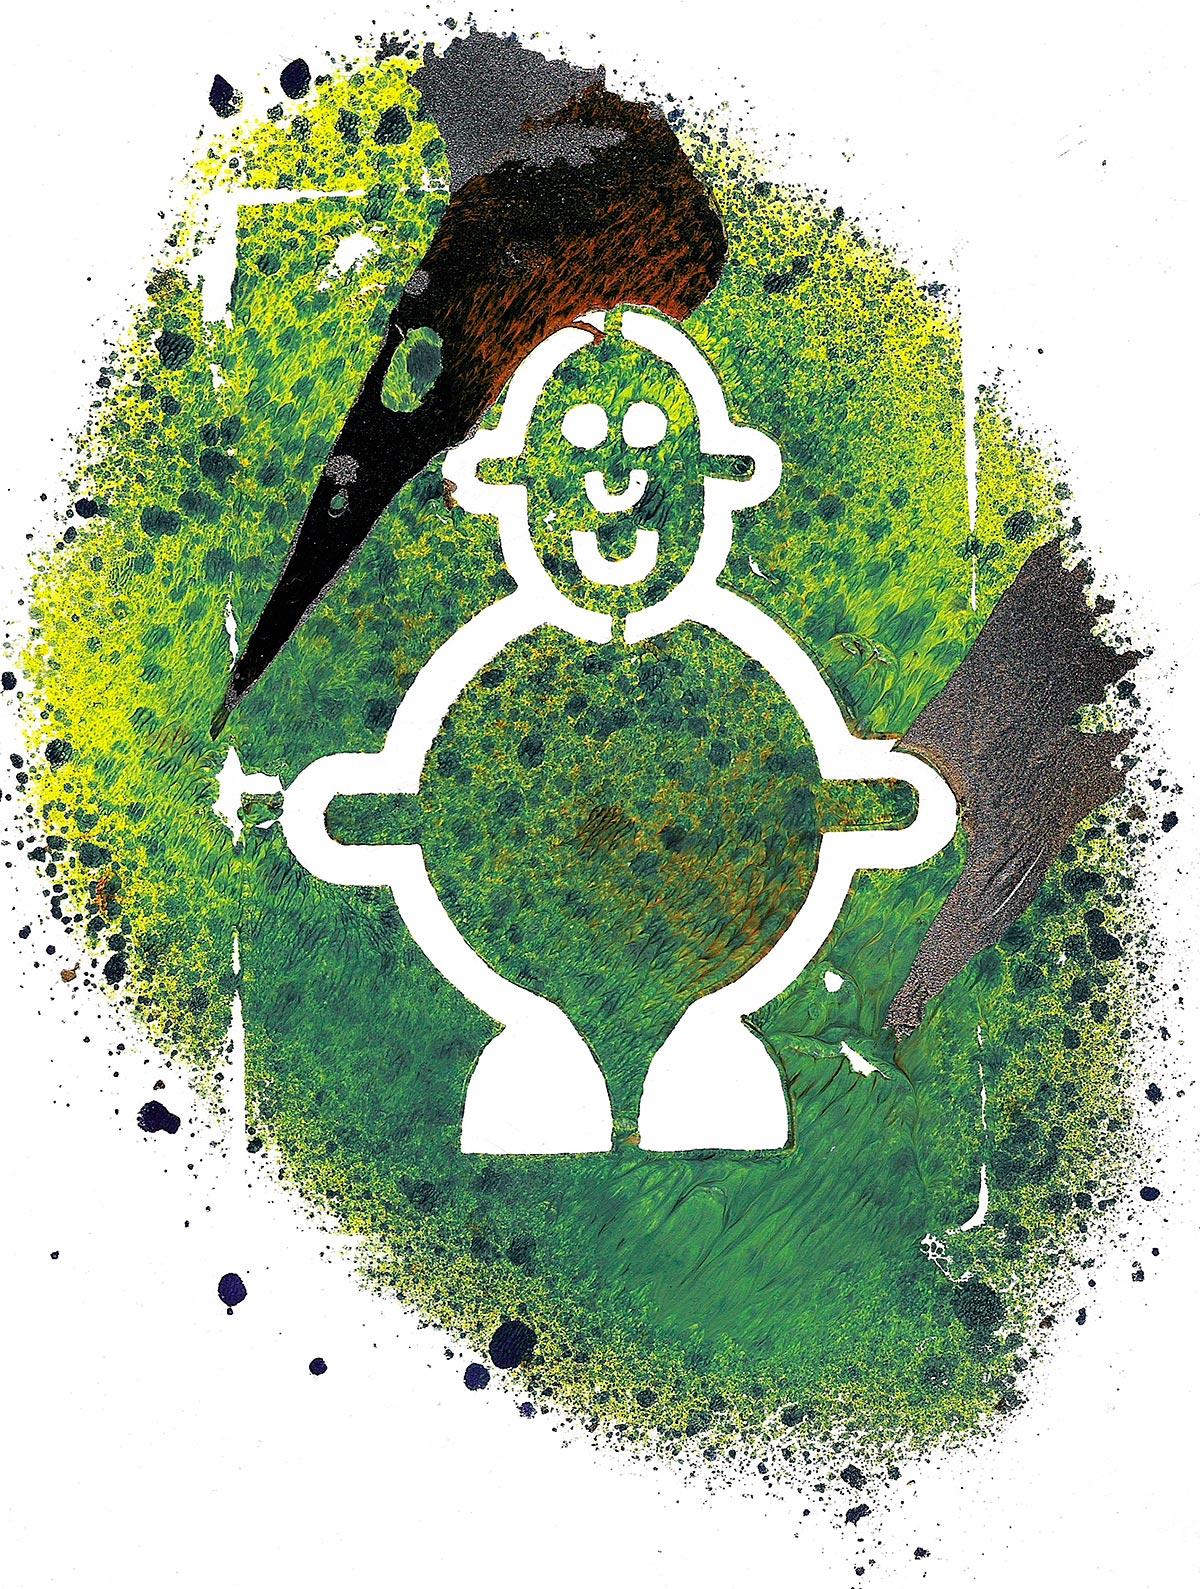 Mr Smileyman Art Print, Stencil